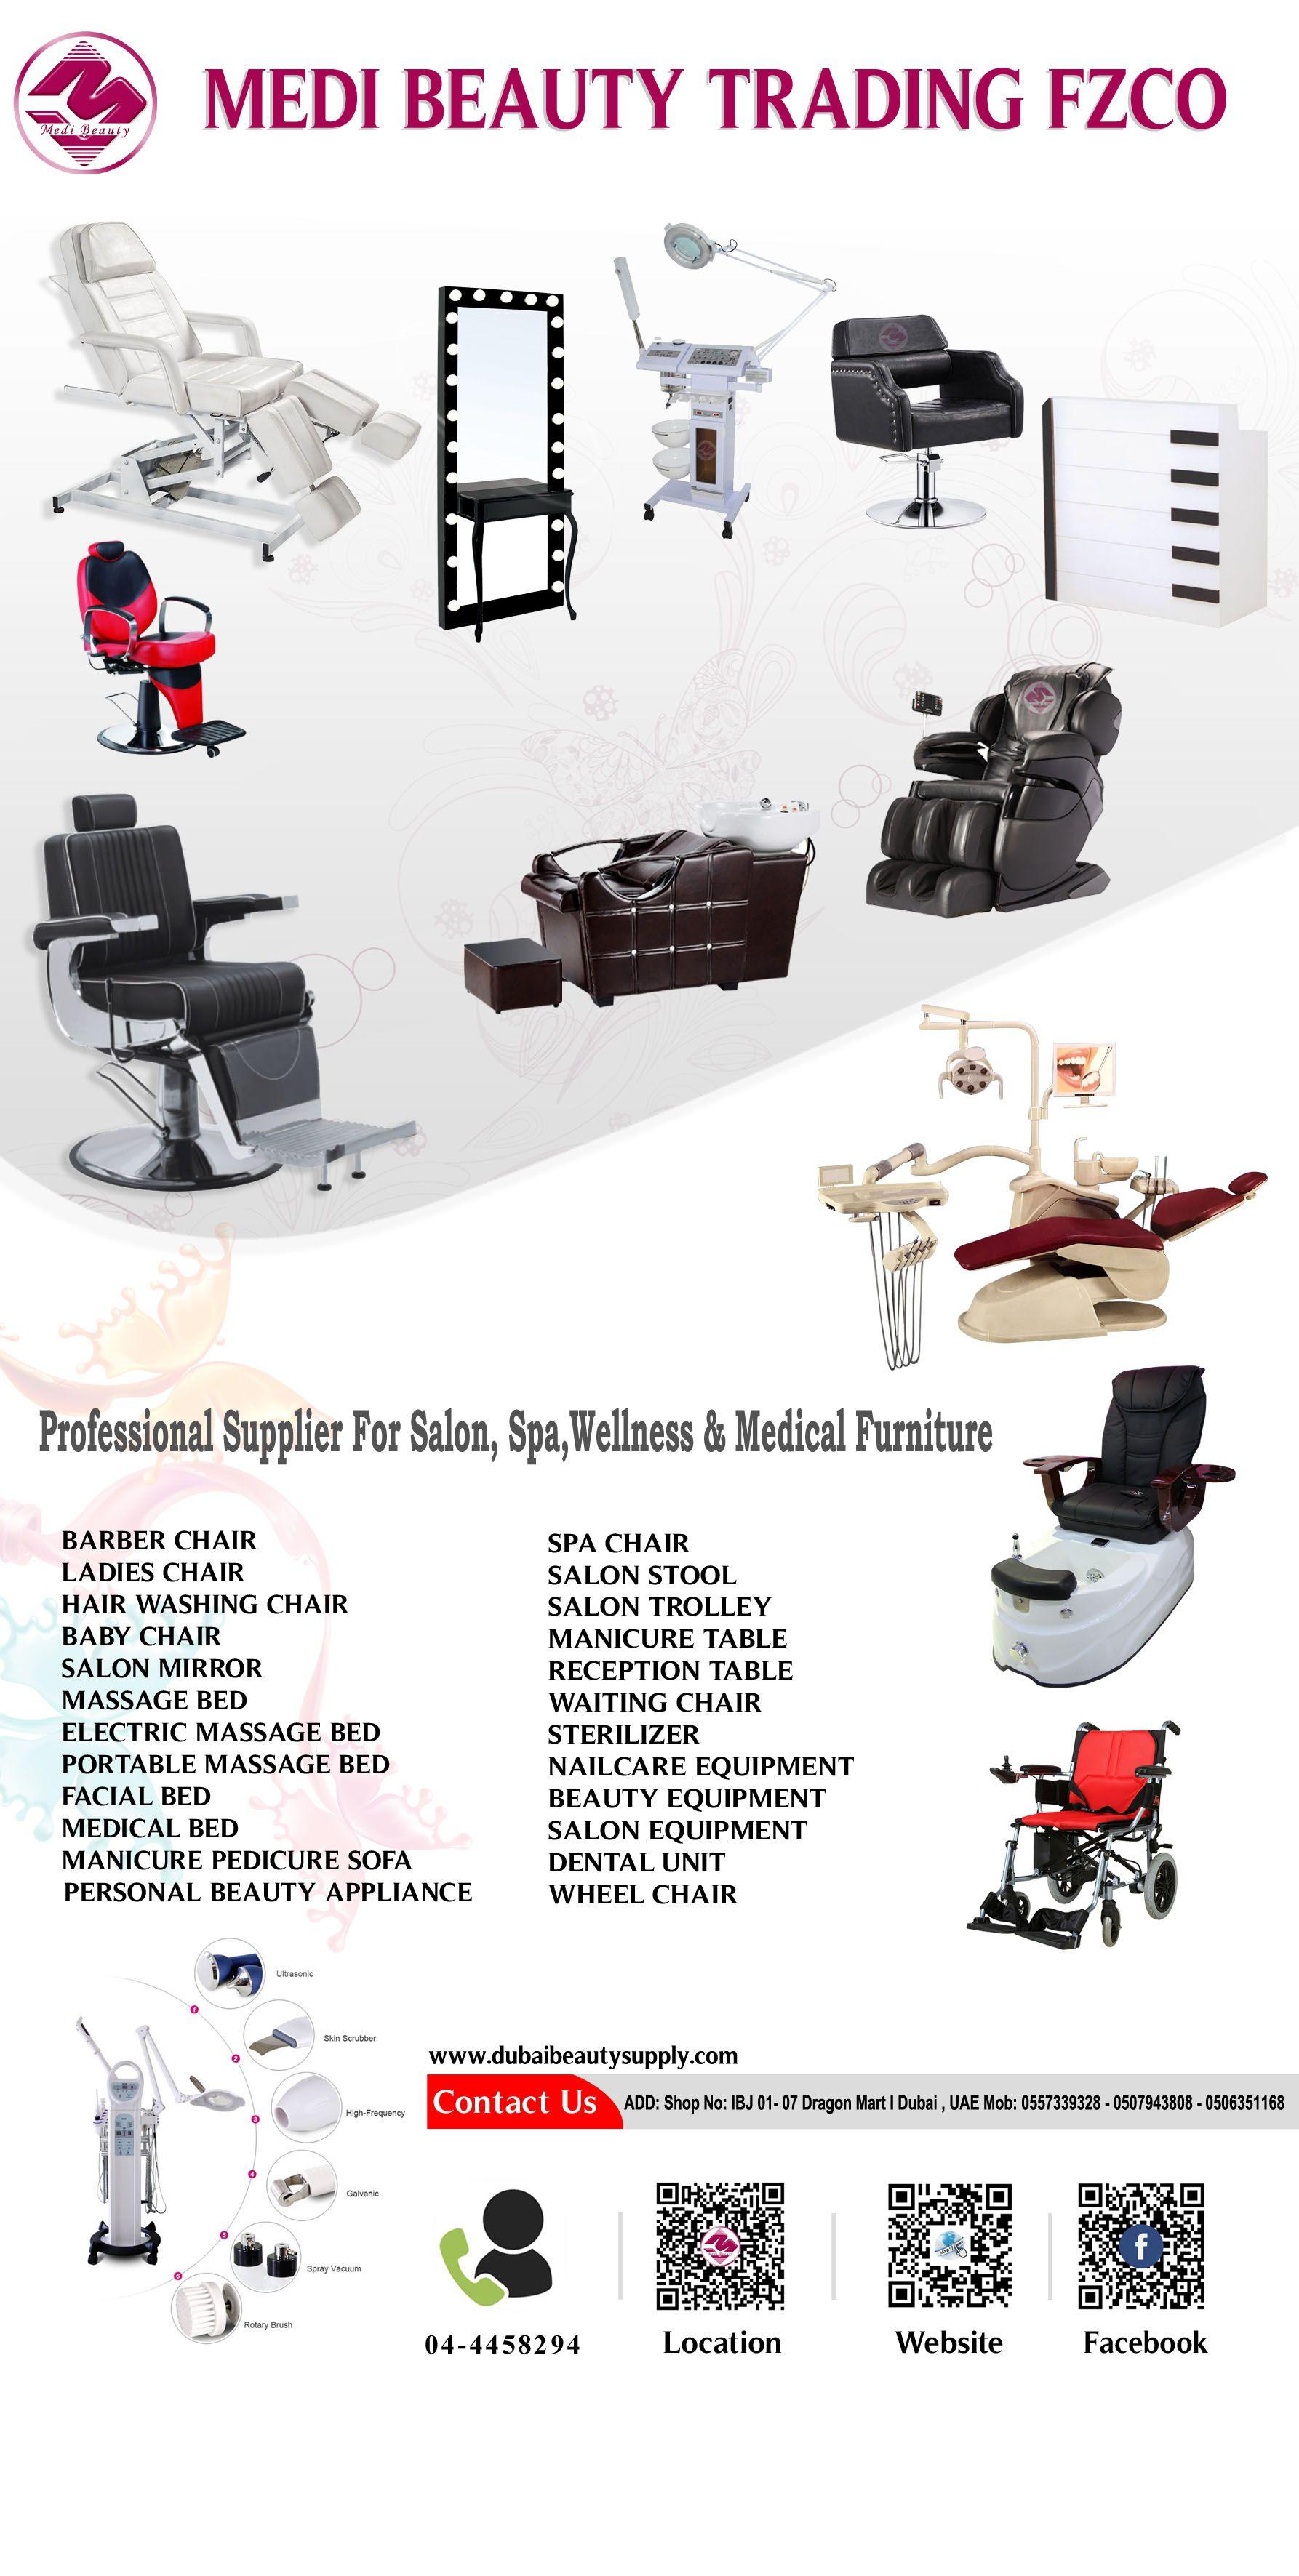 Swell Medi Beauty Trading Products Dubai Uae Salon Furniture Machost Co Dining Chair Design Ideas Machostcouk